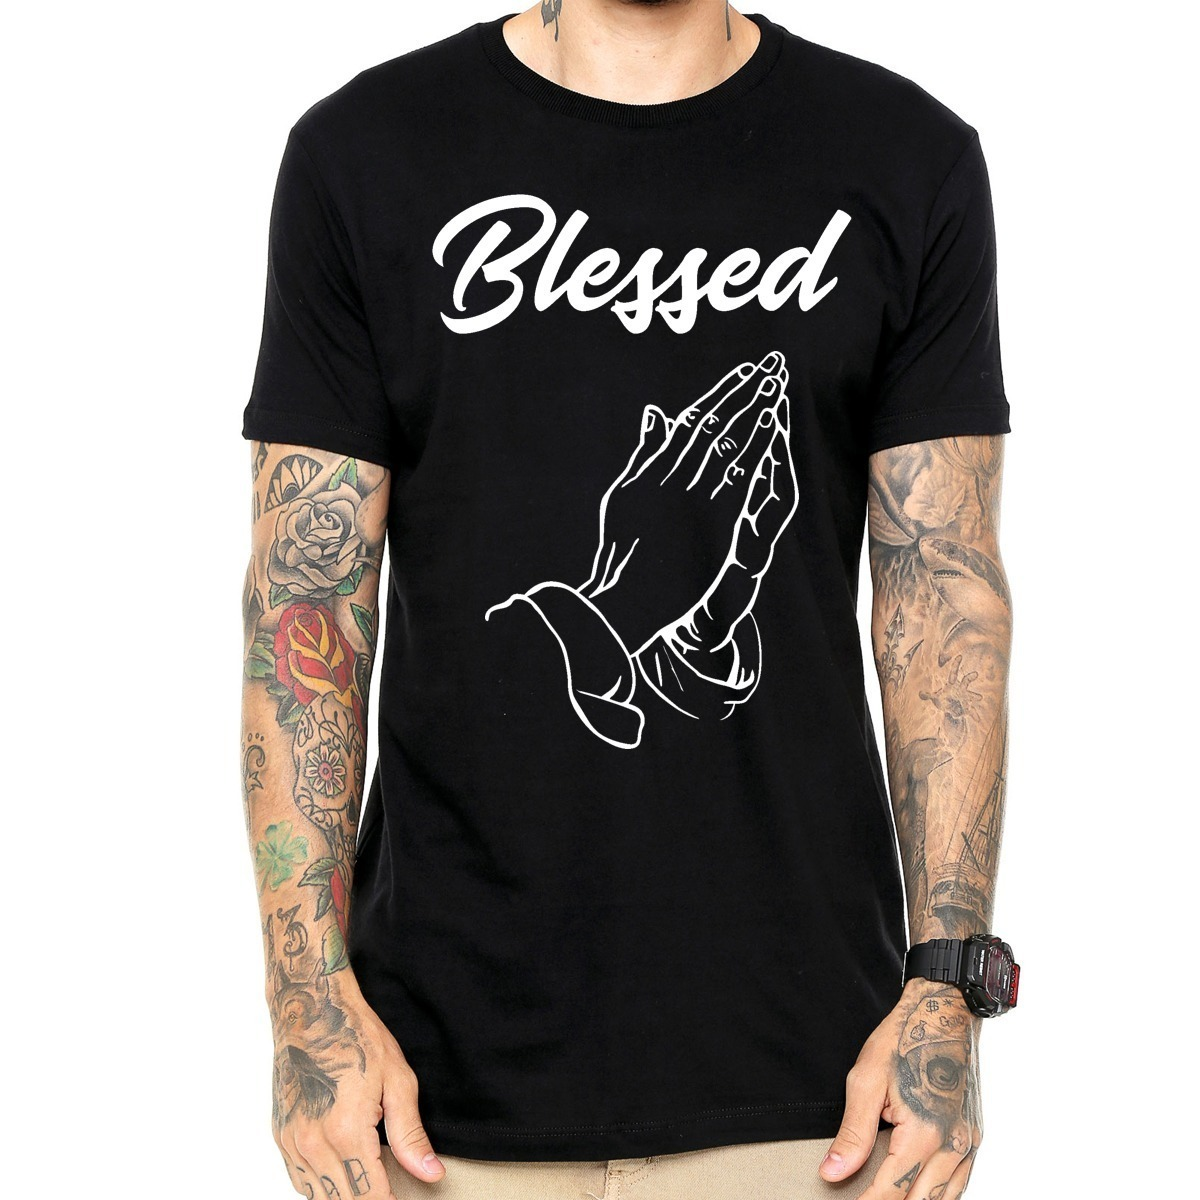 2d82958cb camisa camiseta masculina blessed fé the hope tumblr top. Carregando zoom.